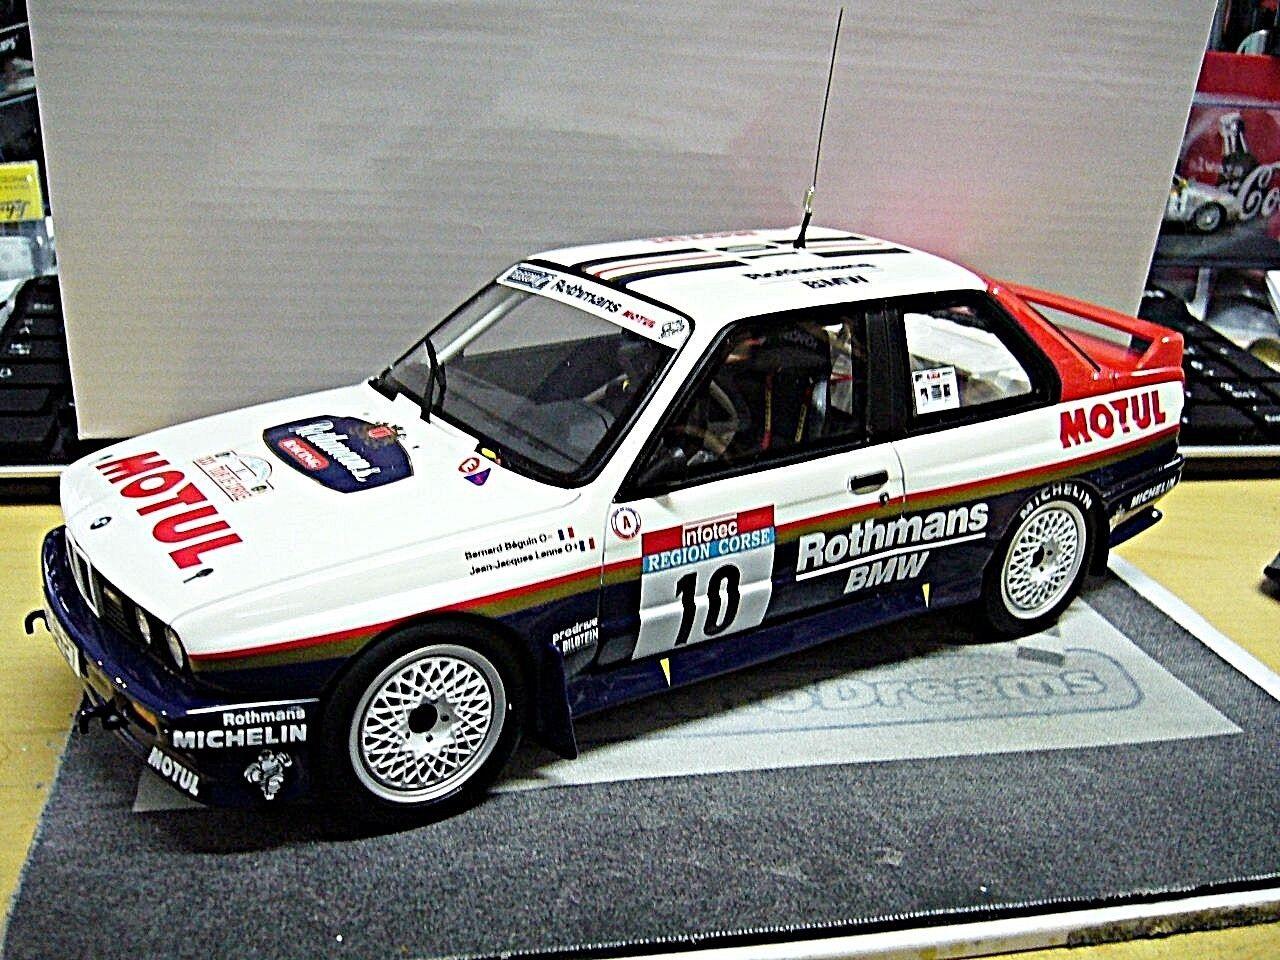 BMW m3 e30 Taille A Rallye Tour de Corse Winner Béguin 1987 OTTO Model RAR 1:18 | De Haute Qualité